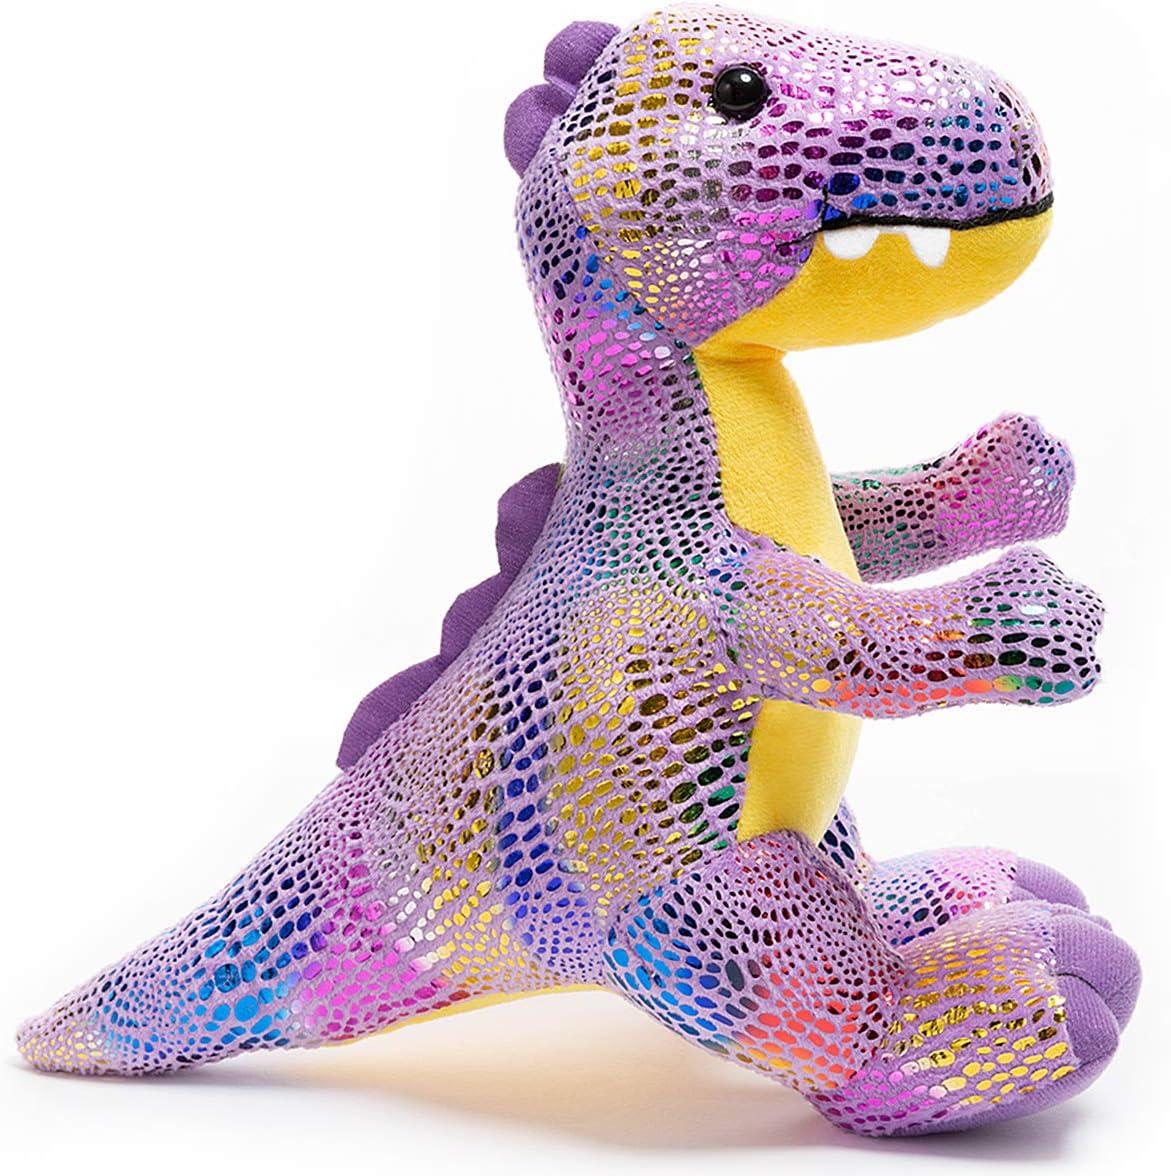 HollyHOME Plush T-Rex Dinosaur Cute Stuffed Animal Toy Kids Gift Purple 10 Inch